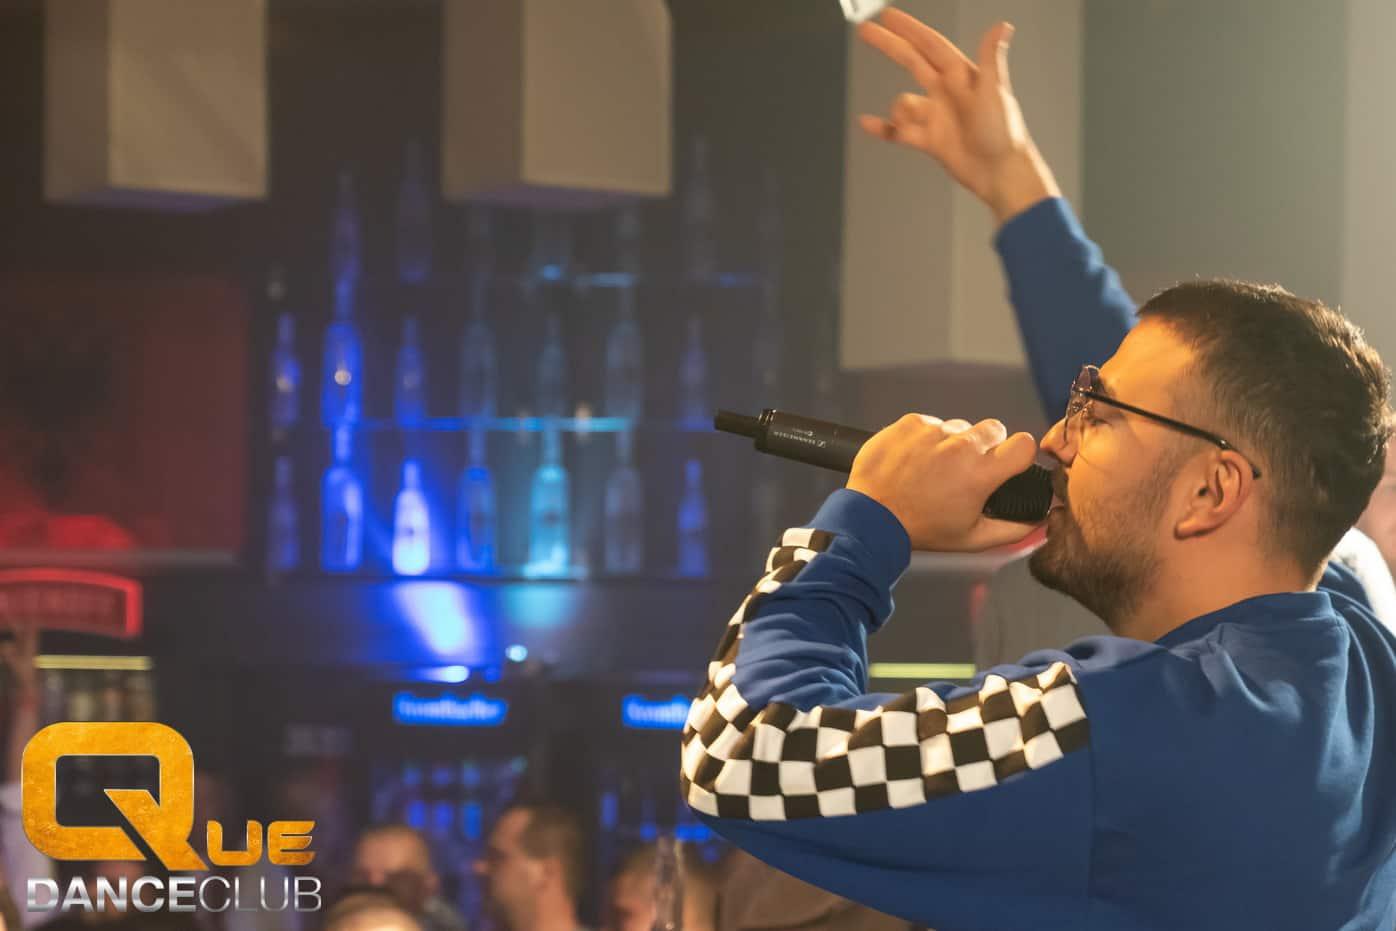 2018_12_08_Que_Danceclub_Paparazzo_Night_Ardian_Bujupi_Live_Nightlife_Scene_Timo_052